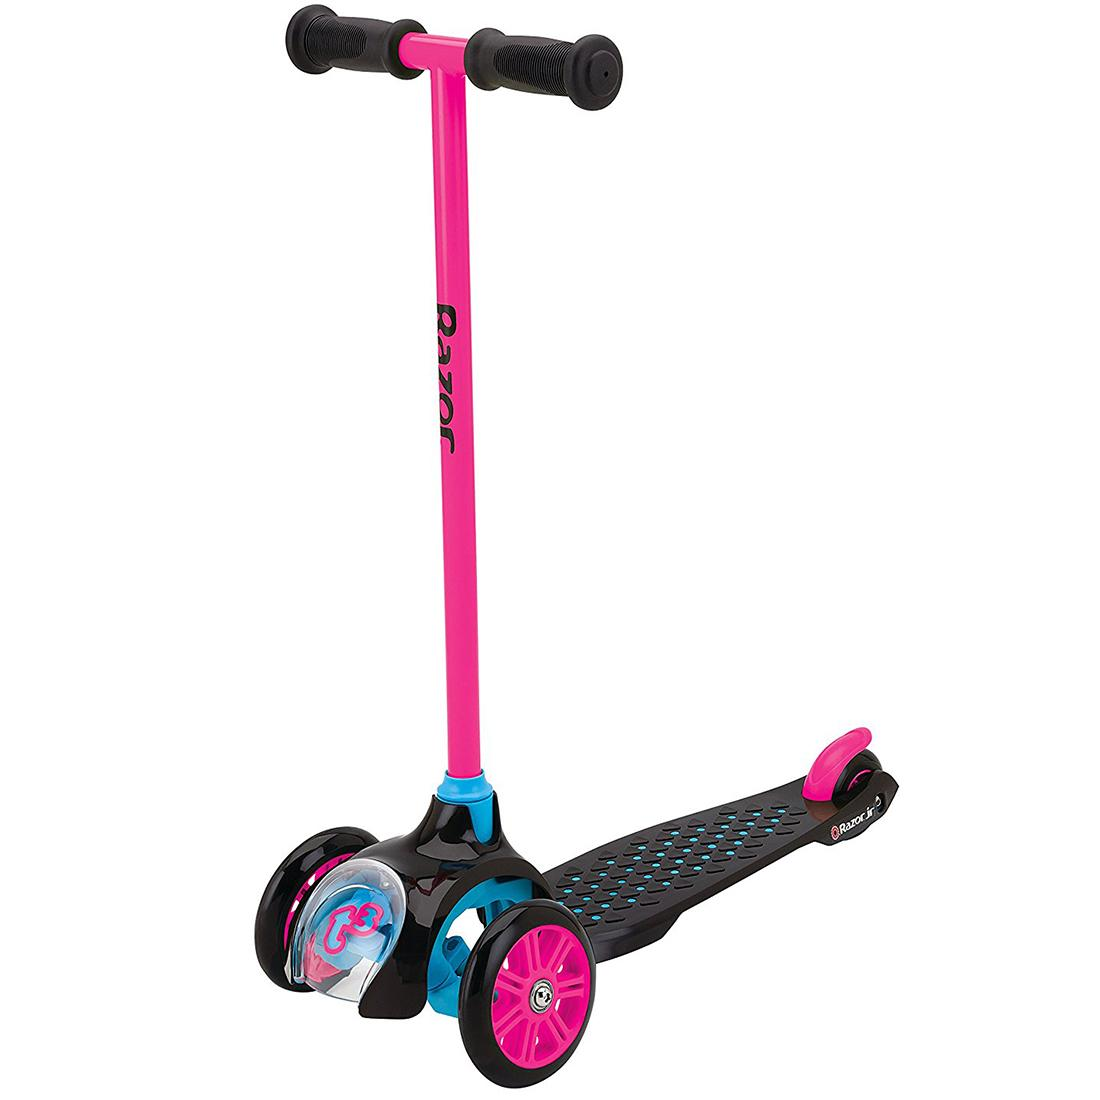 Giá bán Xe trượt Razor Junior T3 Scooter